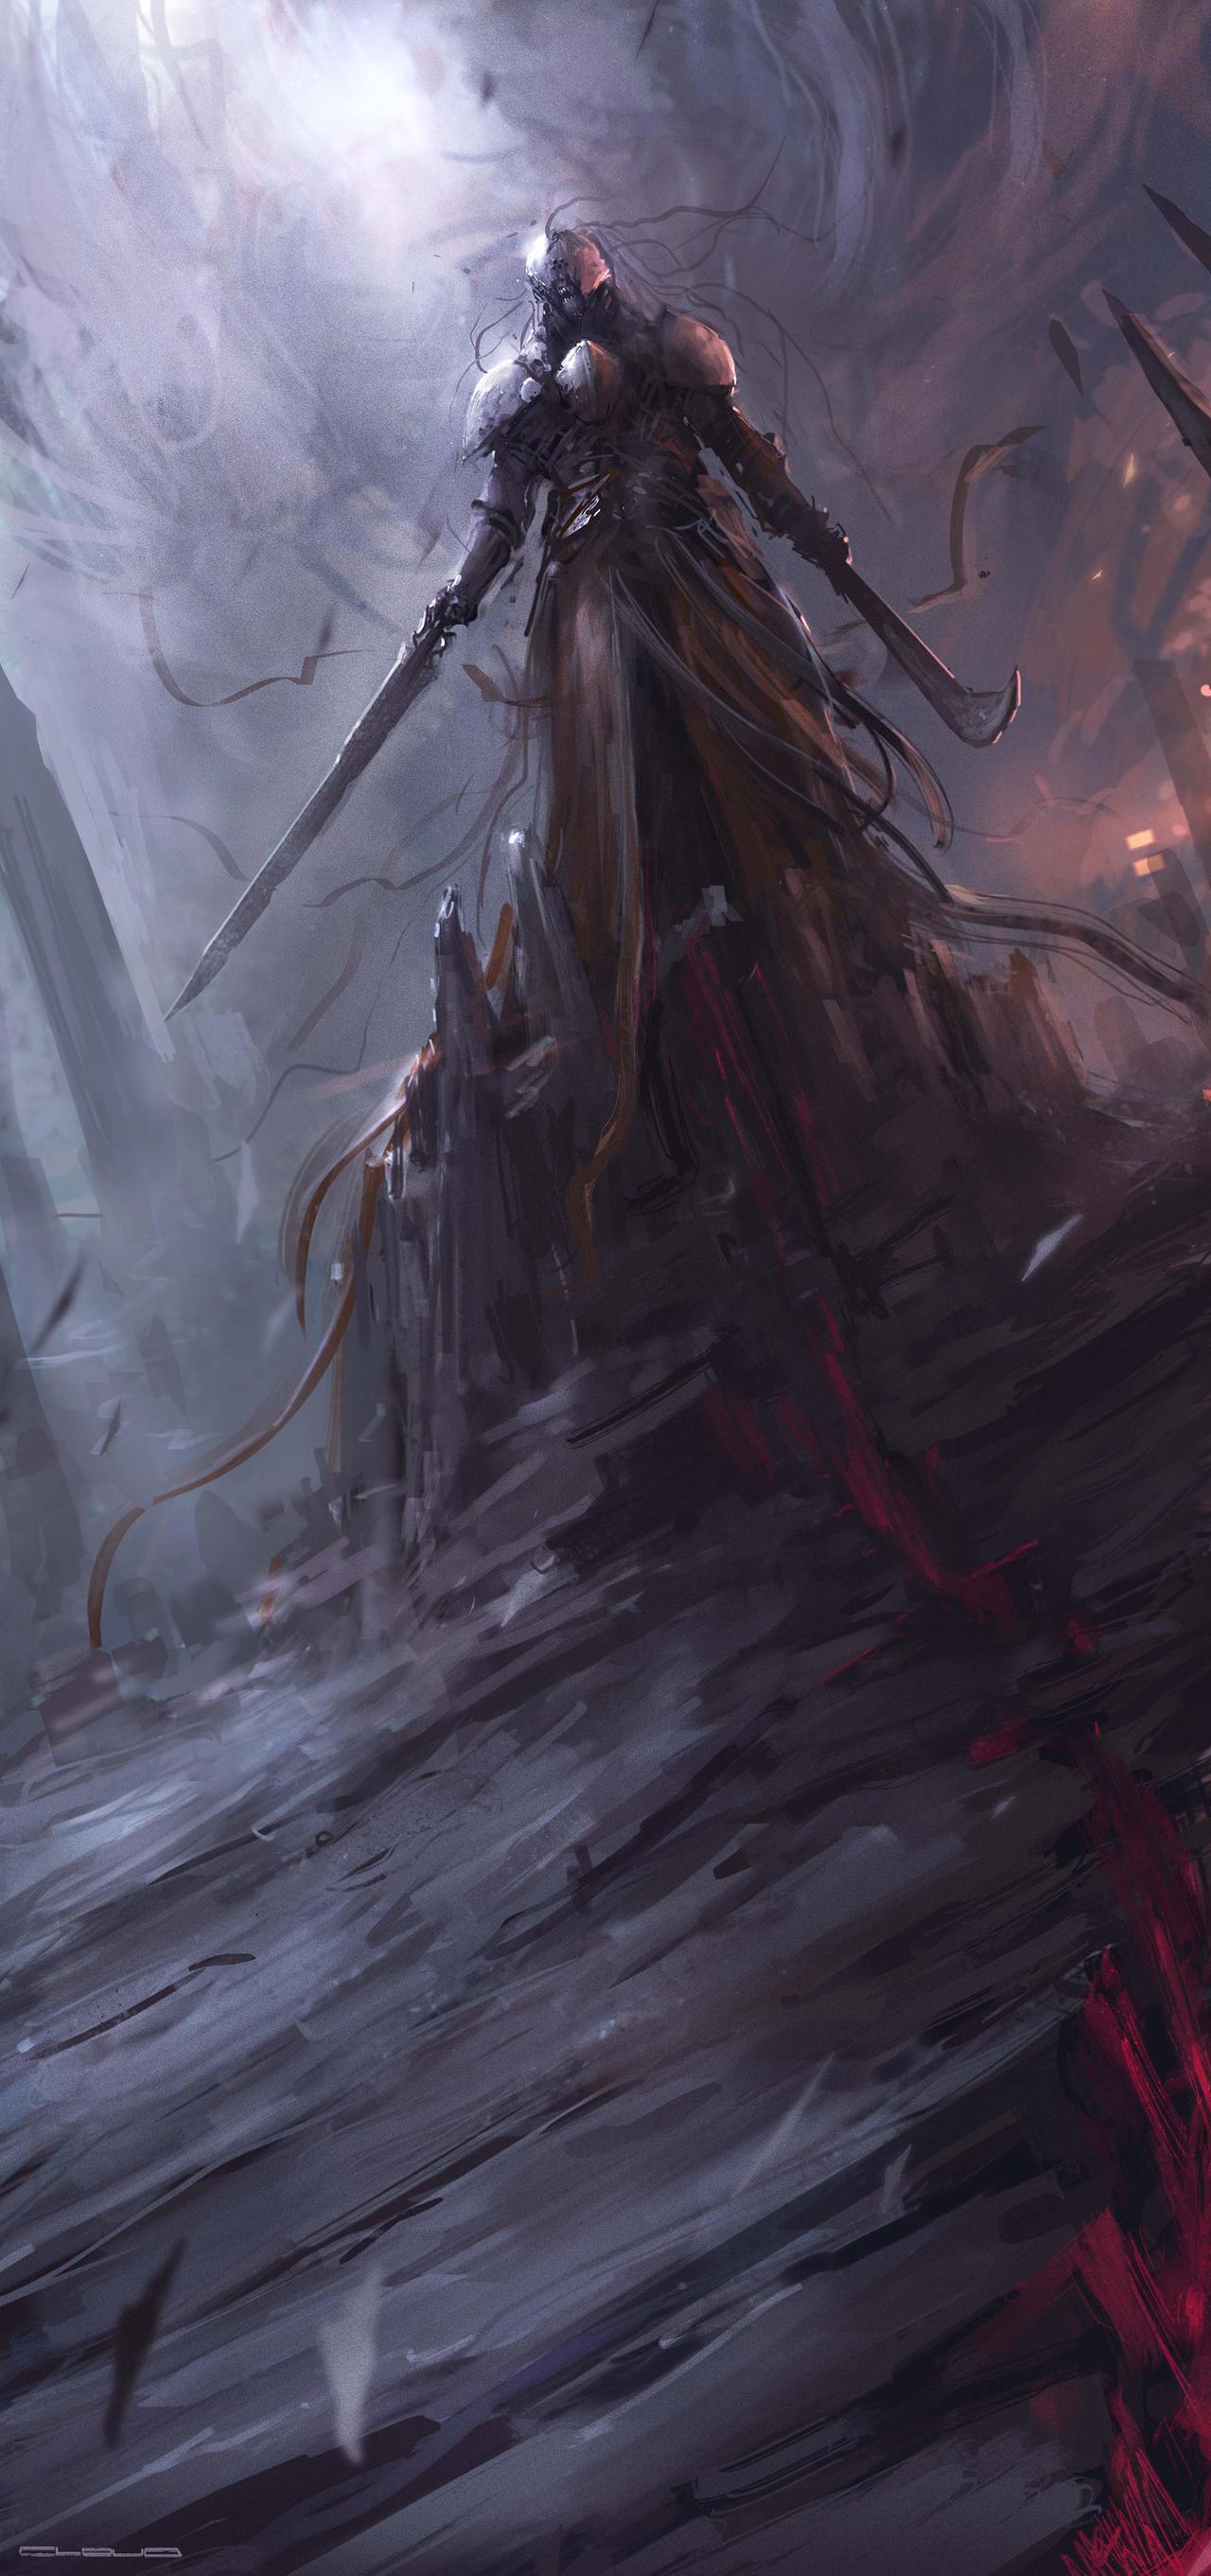 Swordsman by Darkcloud013